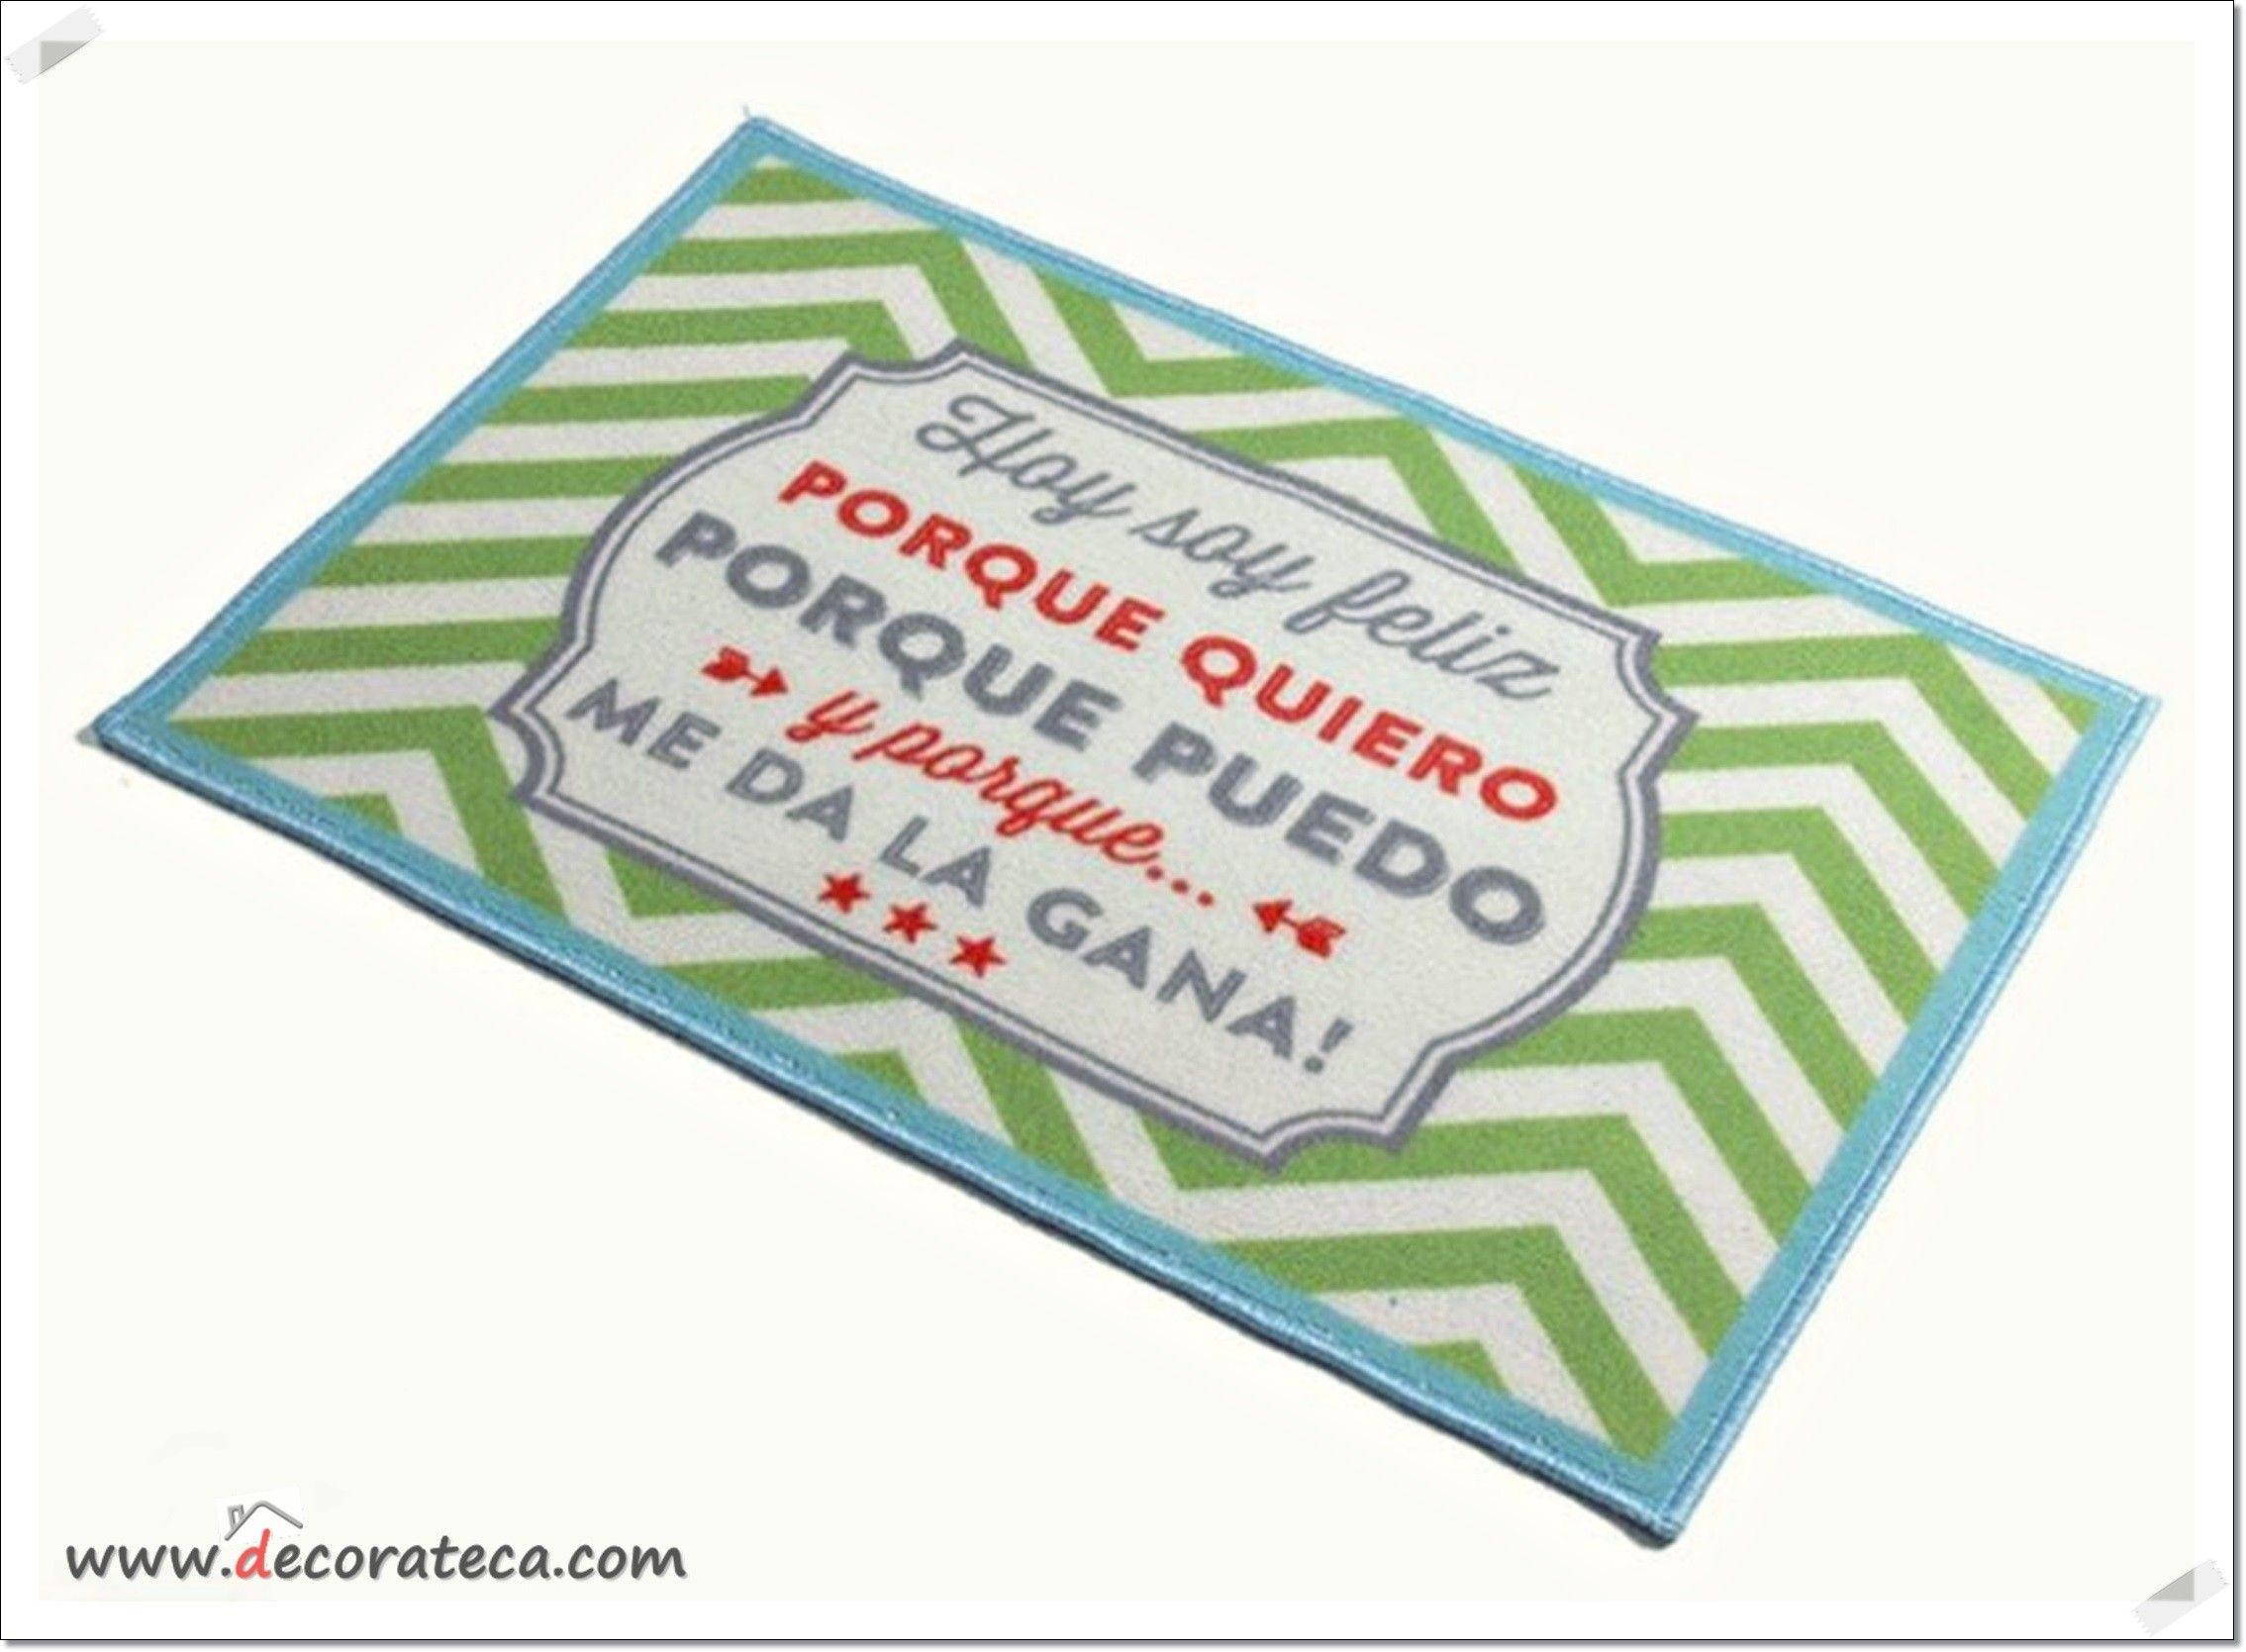 Original alfombra antideslizante \